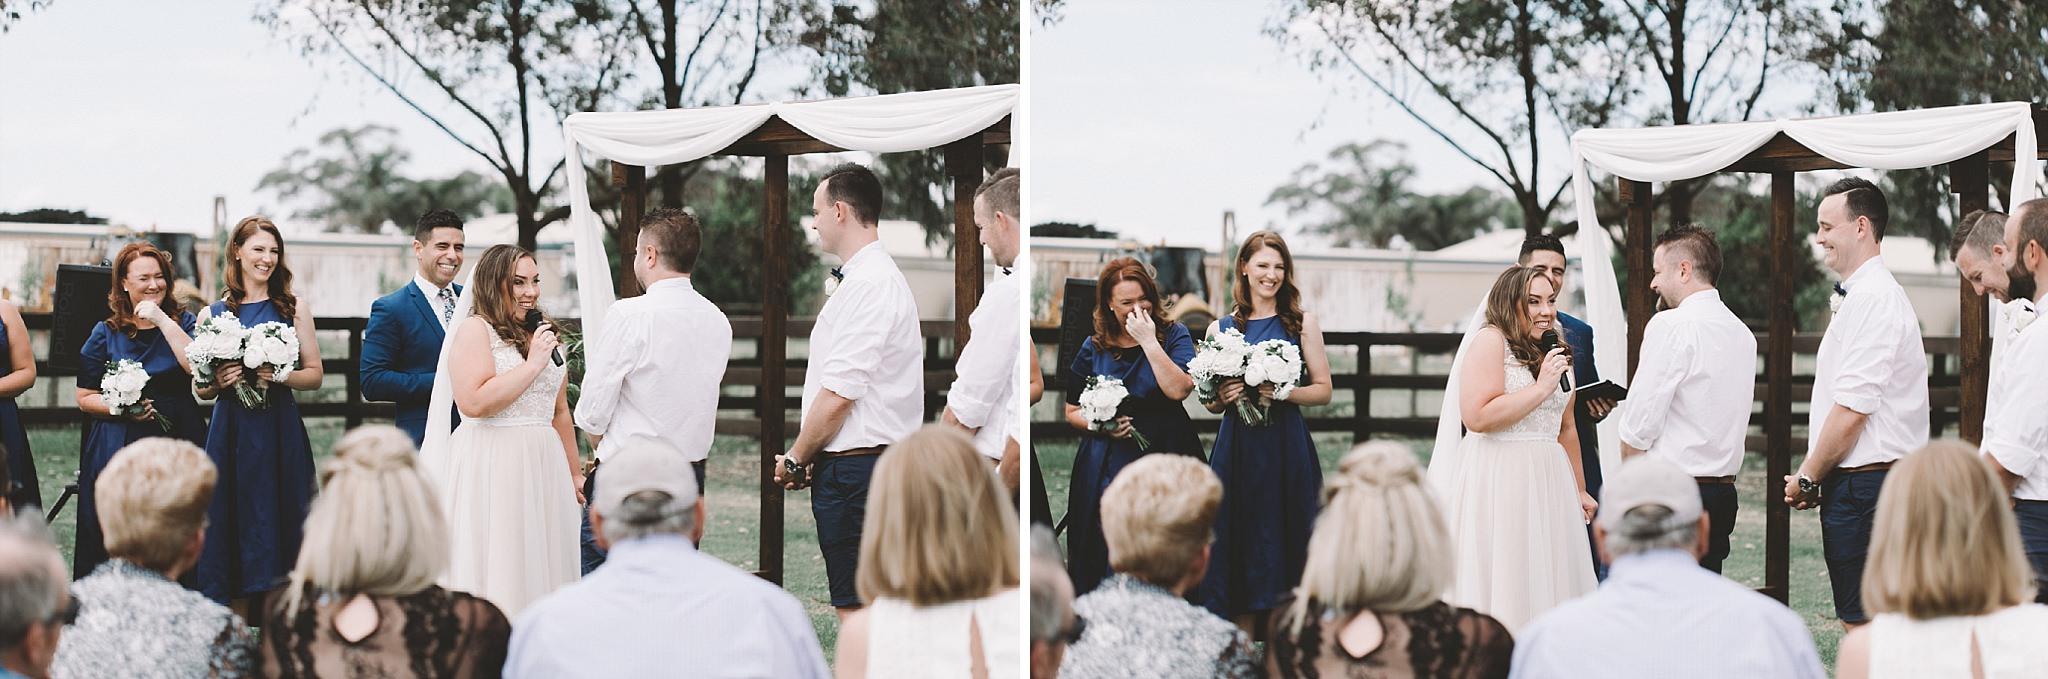 Mornington Peninsula Wedding Photographer 99.JPG